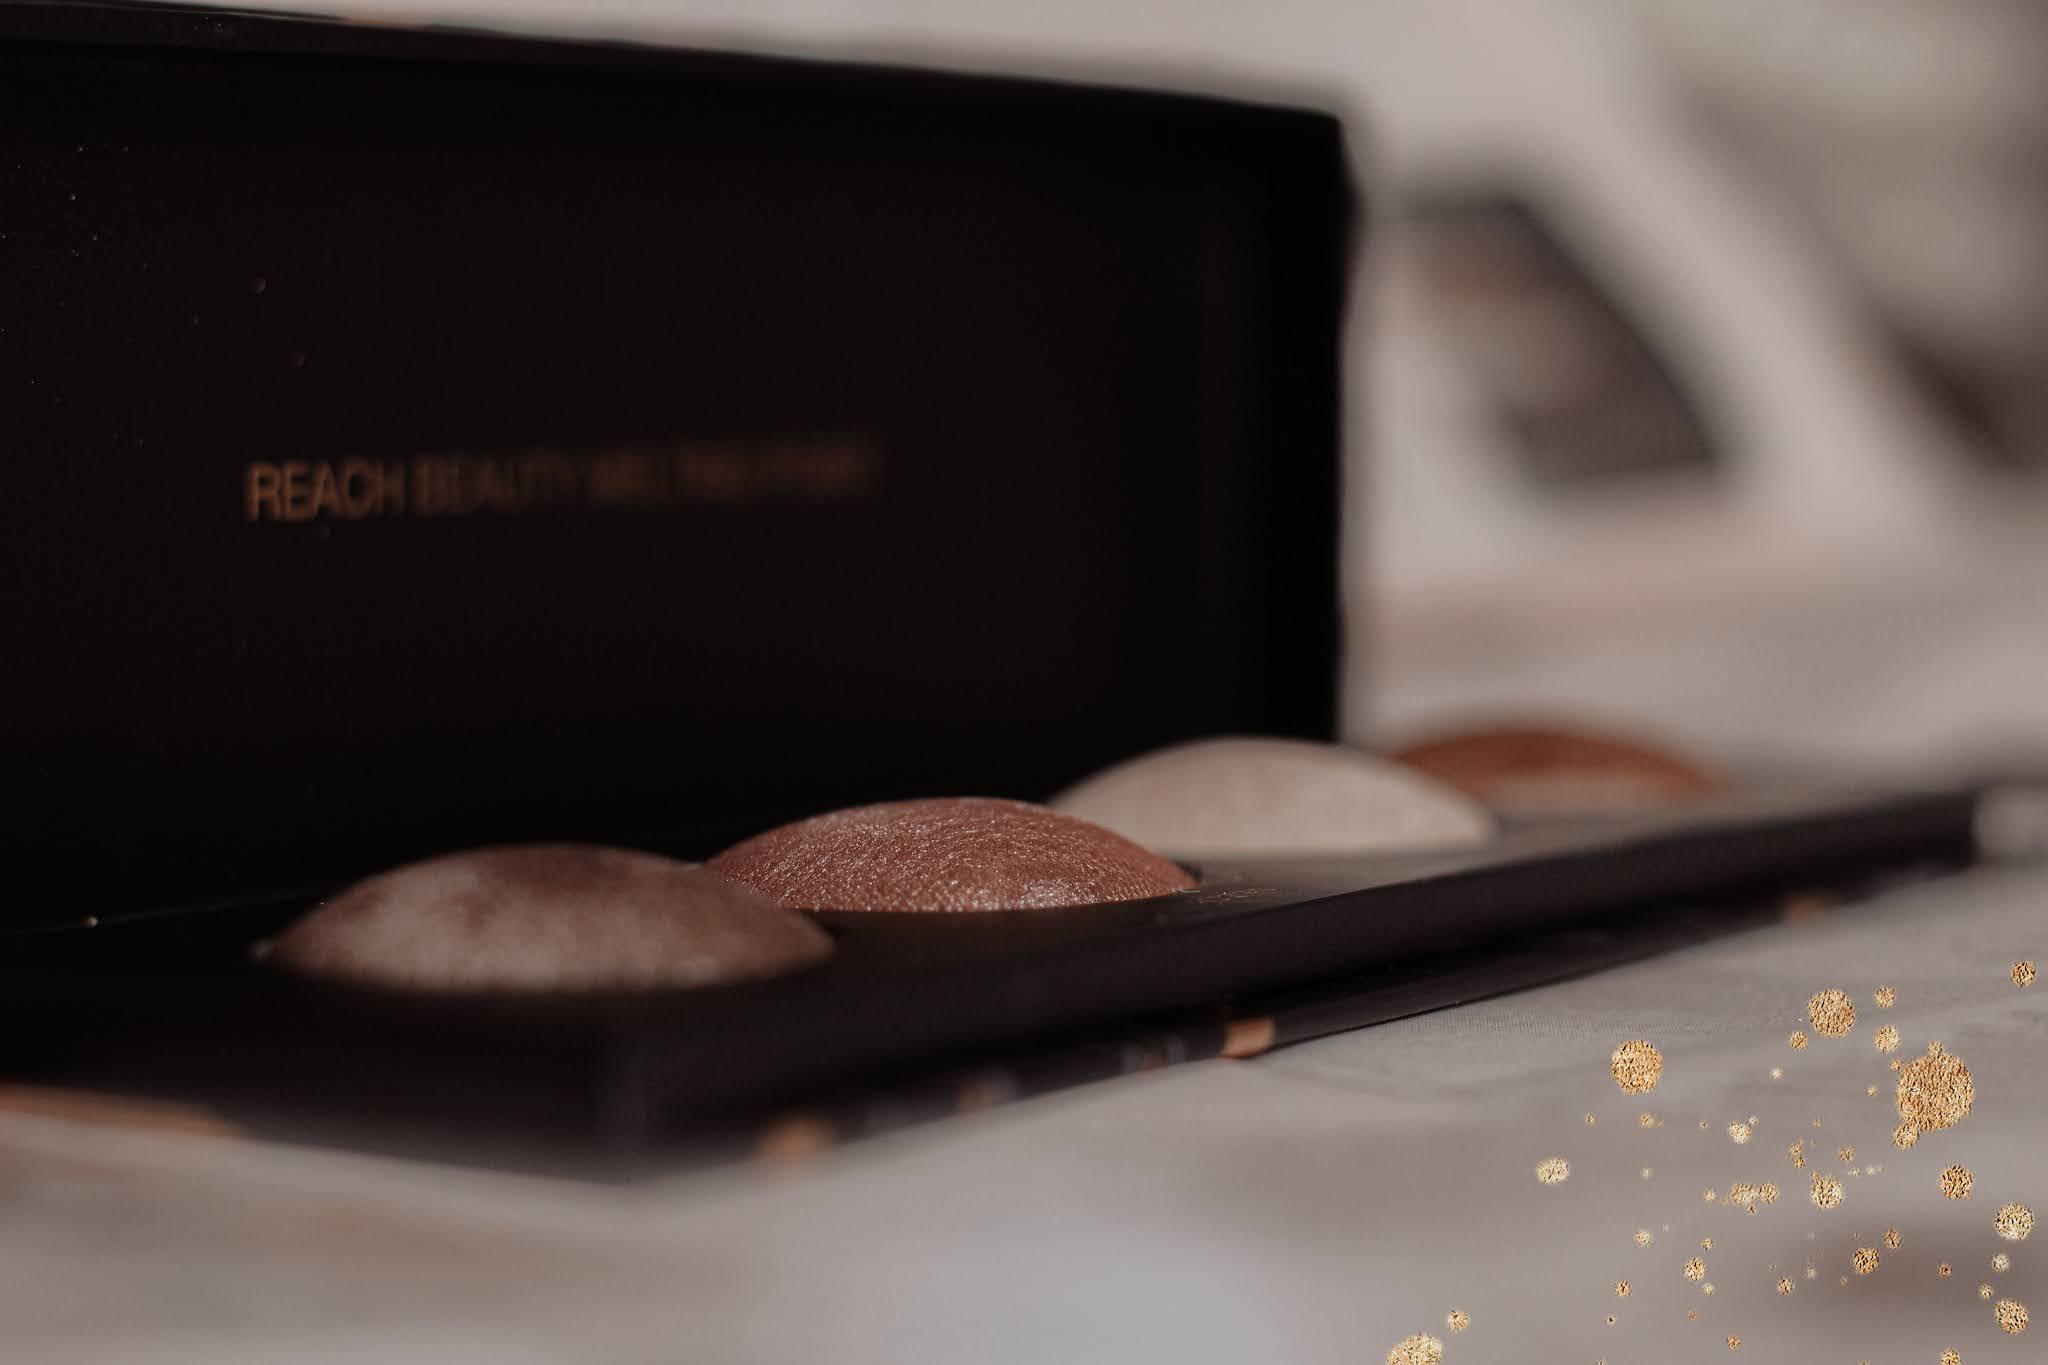 Mii Cosmetics Molten Luxe Eyeshadow Palette